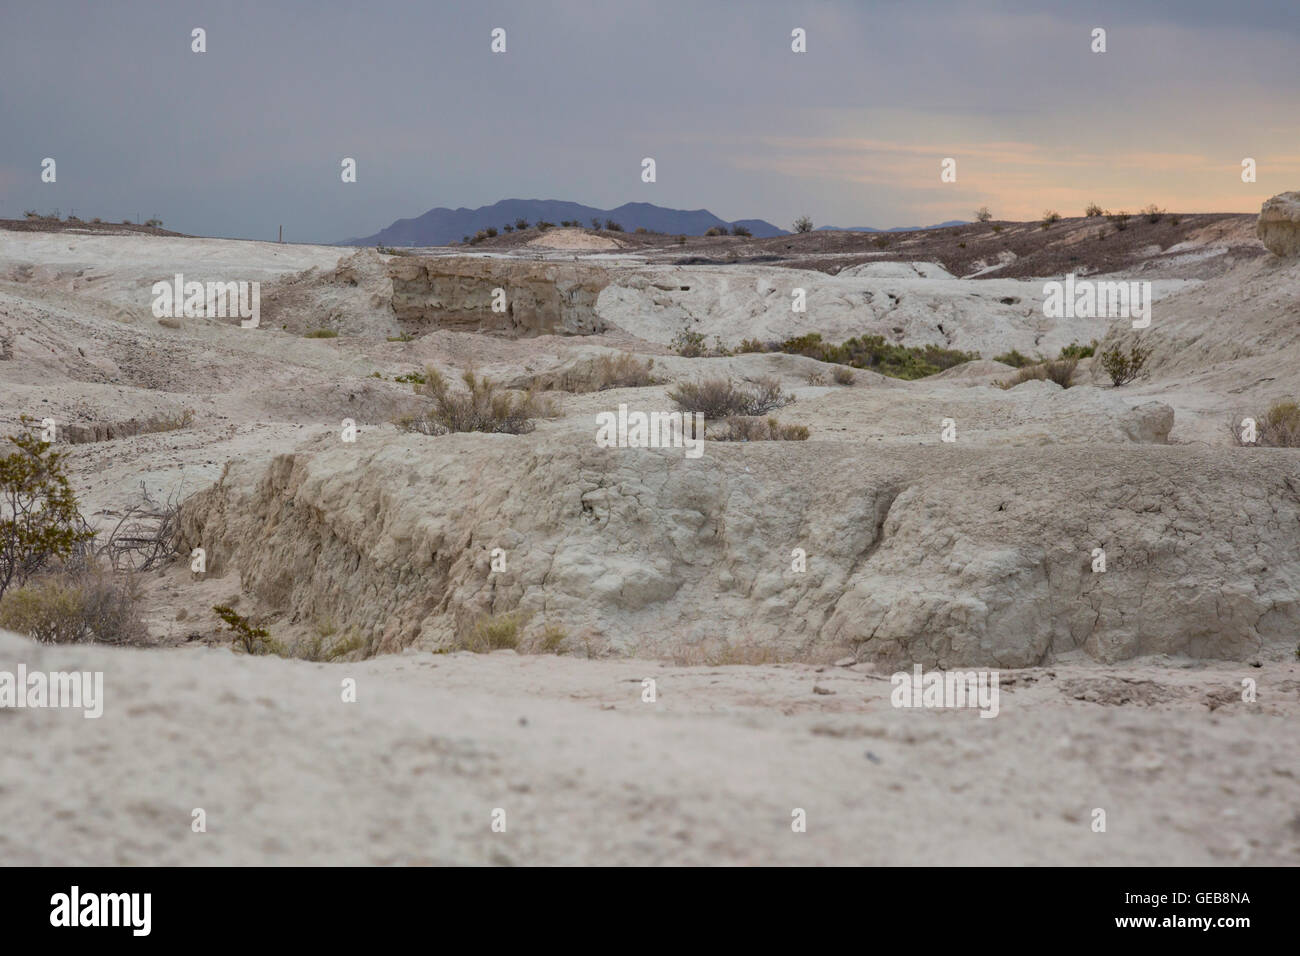 Las Vegas, Nevada - Tule Springs Fossil Beds National Monument, a rich paleontological area established in December - Stock Image